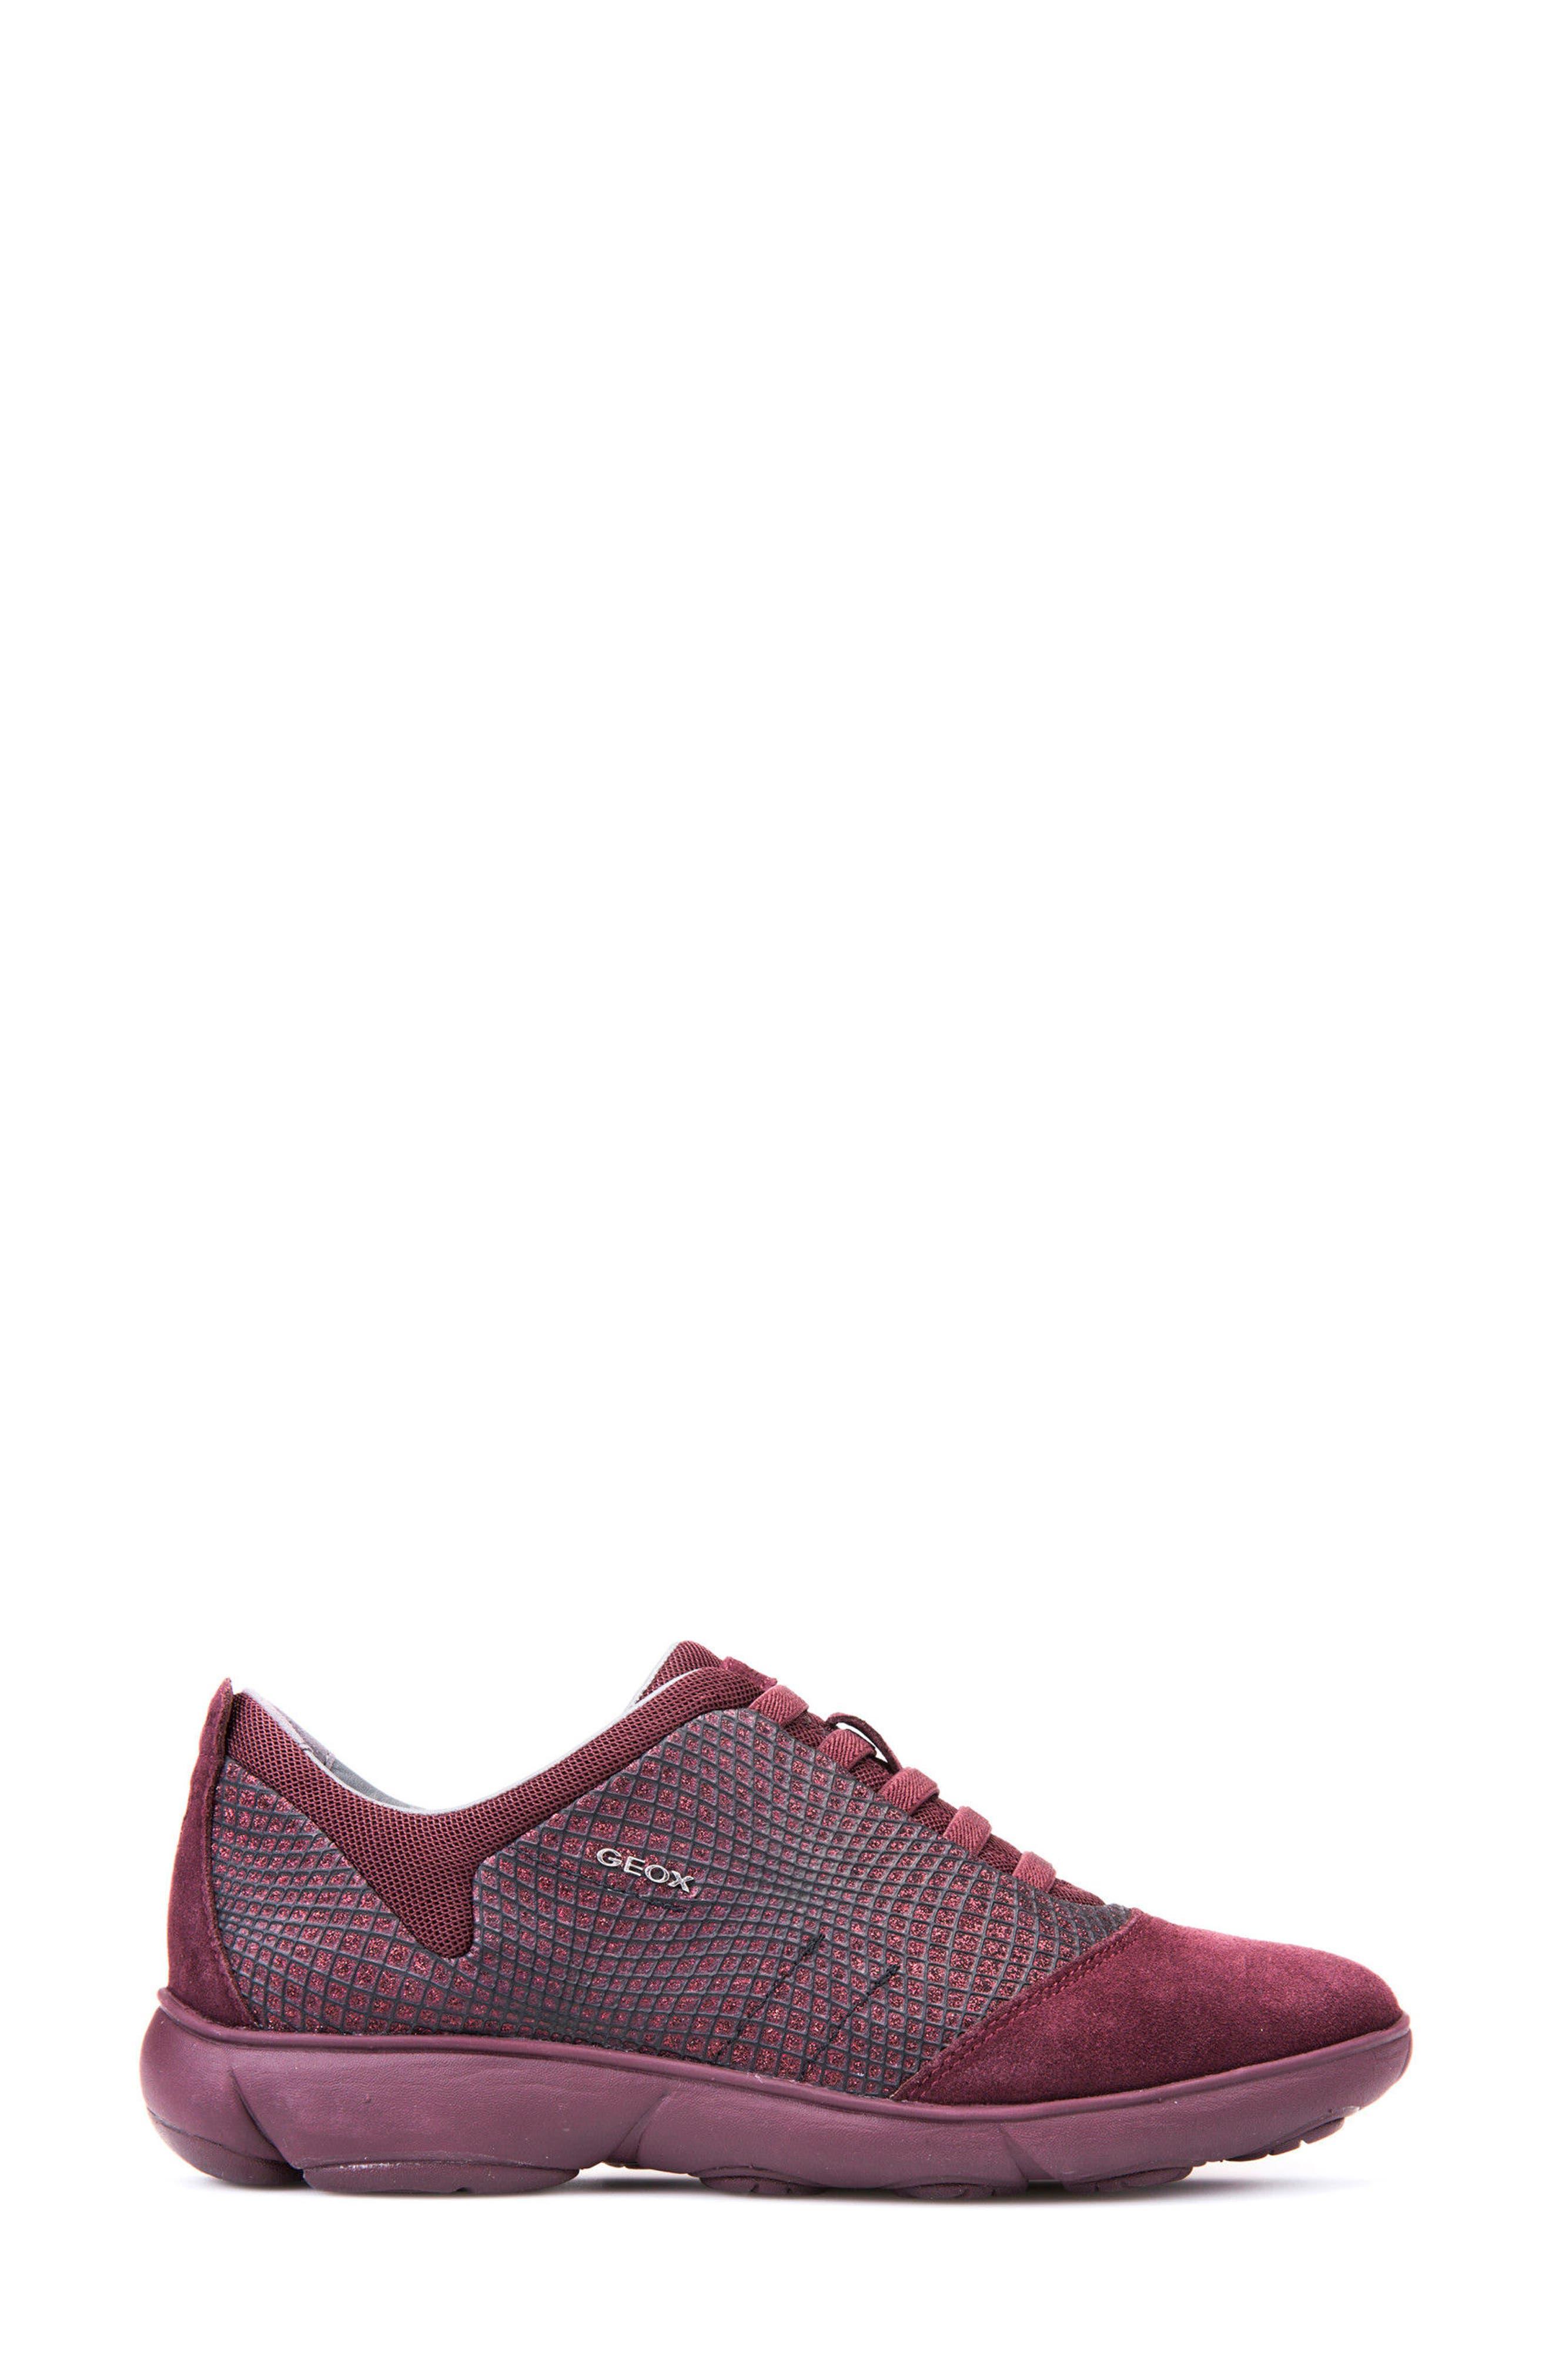 Alternate Image 3  - Geox Nebula Slip-On Sneaker (Women)